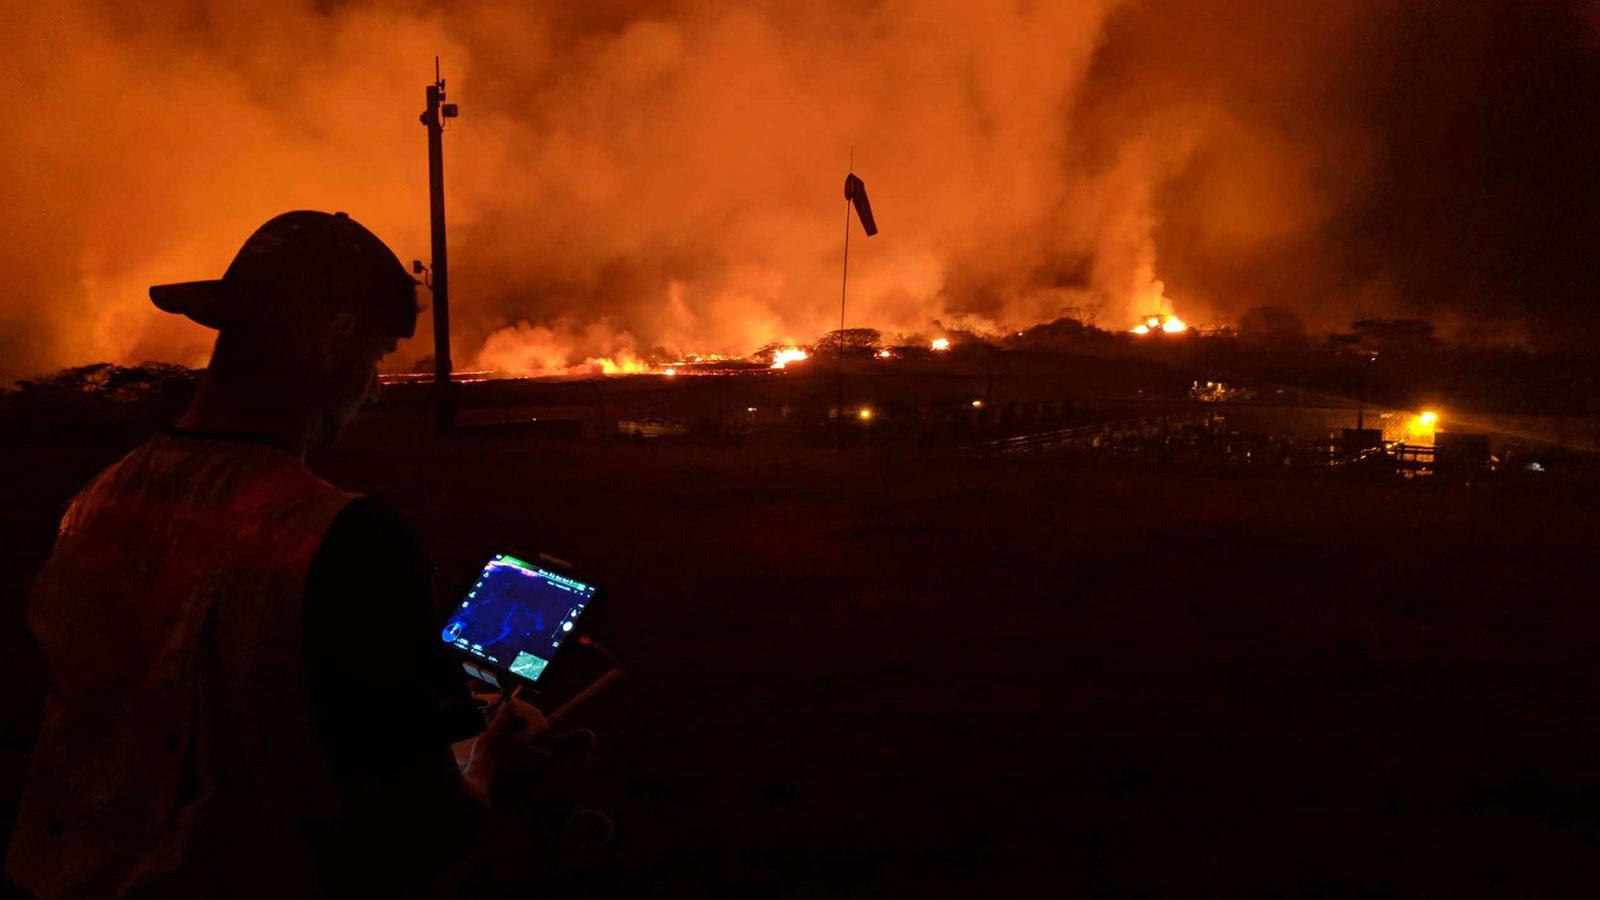 volcano erruption in Hawaii